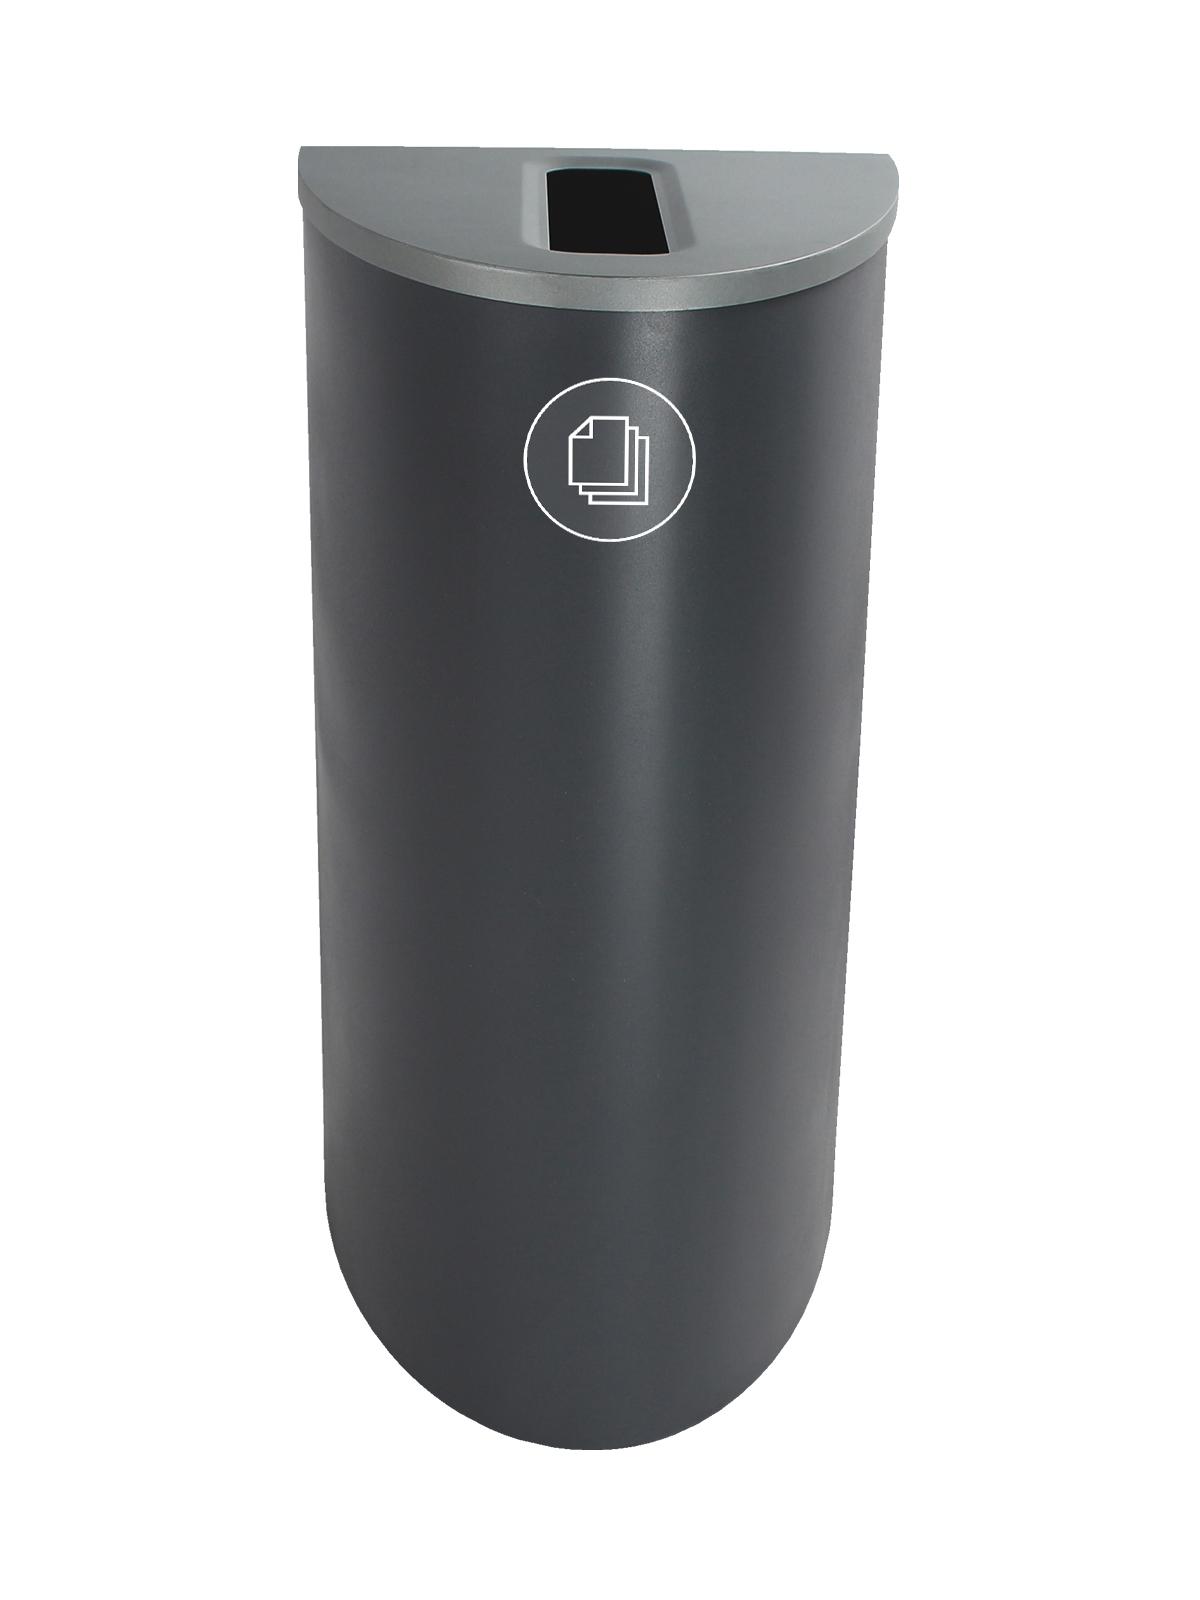 SPECTRUM - Single - Ellipse - Paper - Slot - Grey